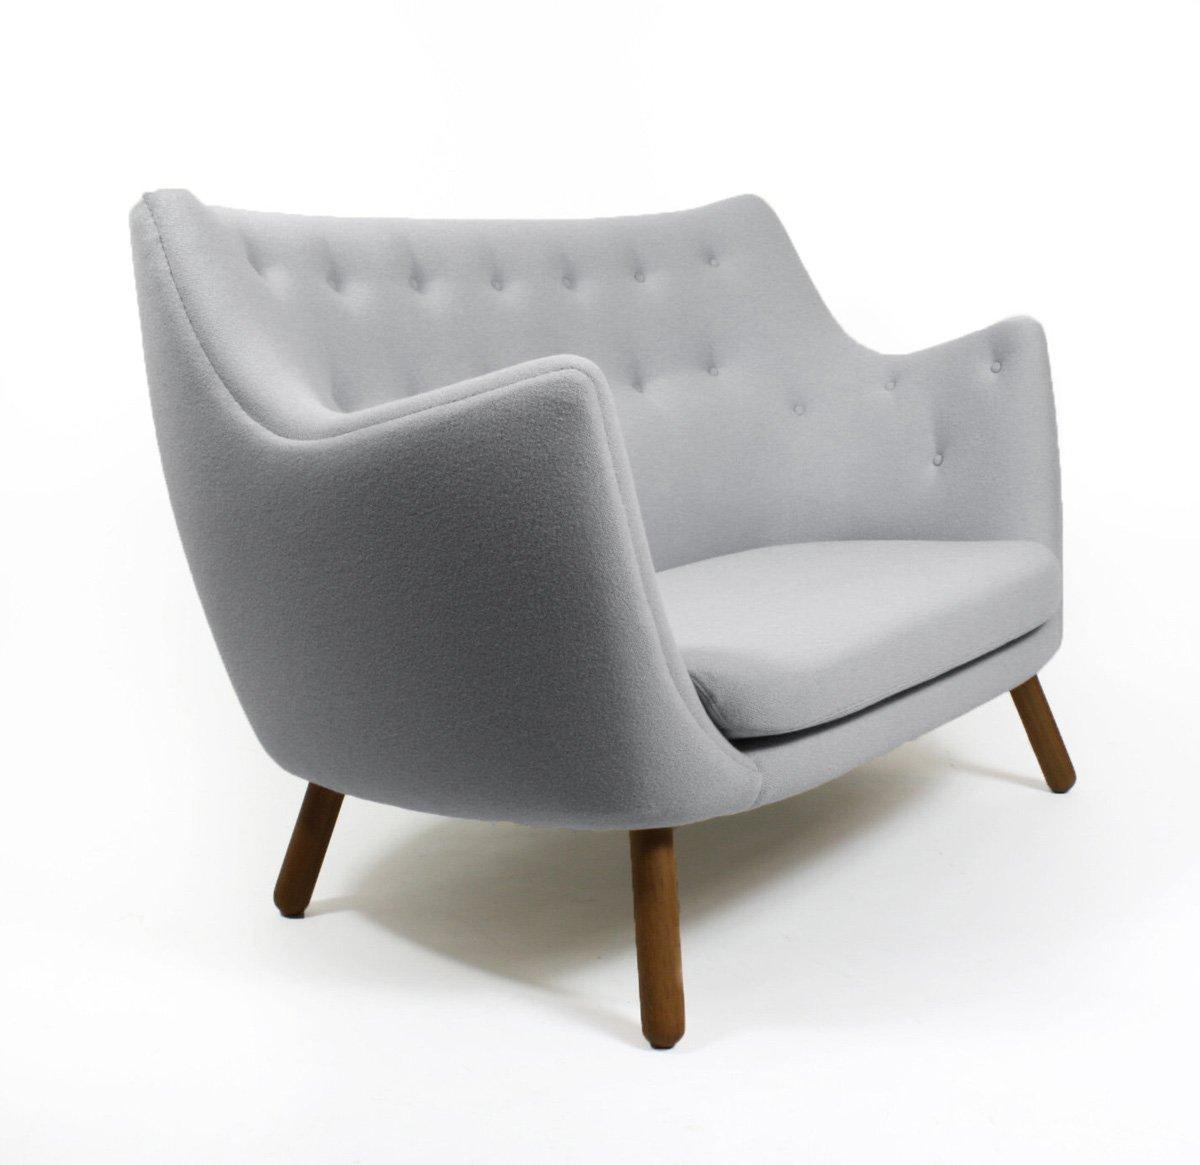 Galway   Juhl Poeten Sofa Furniture-Living Room-Sofas & Couches